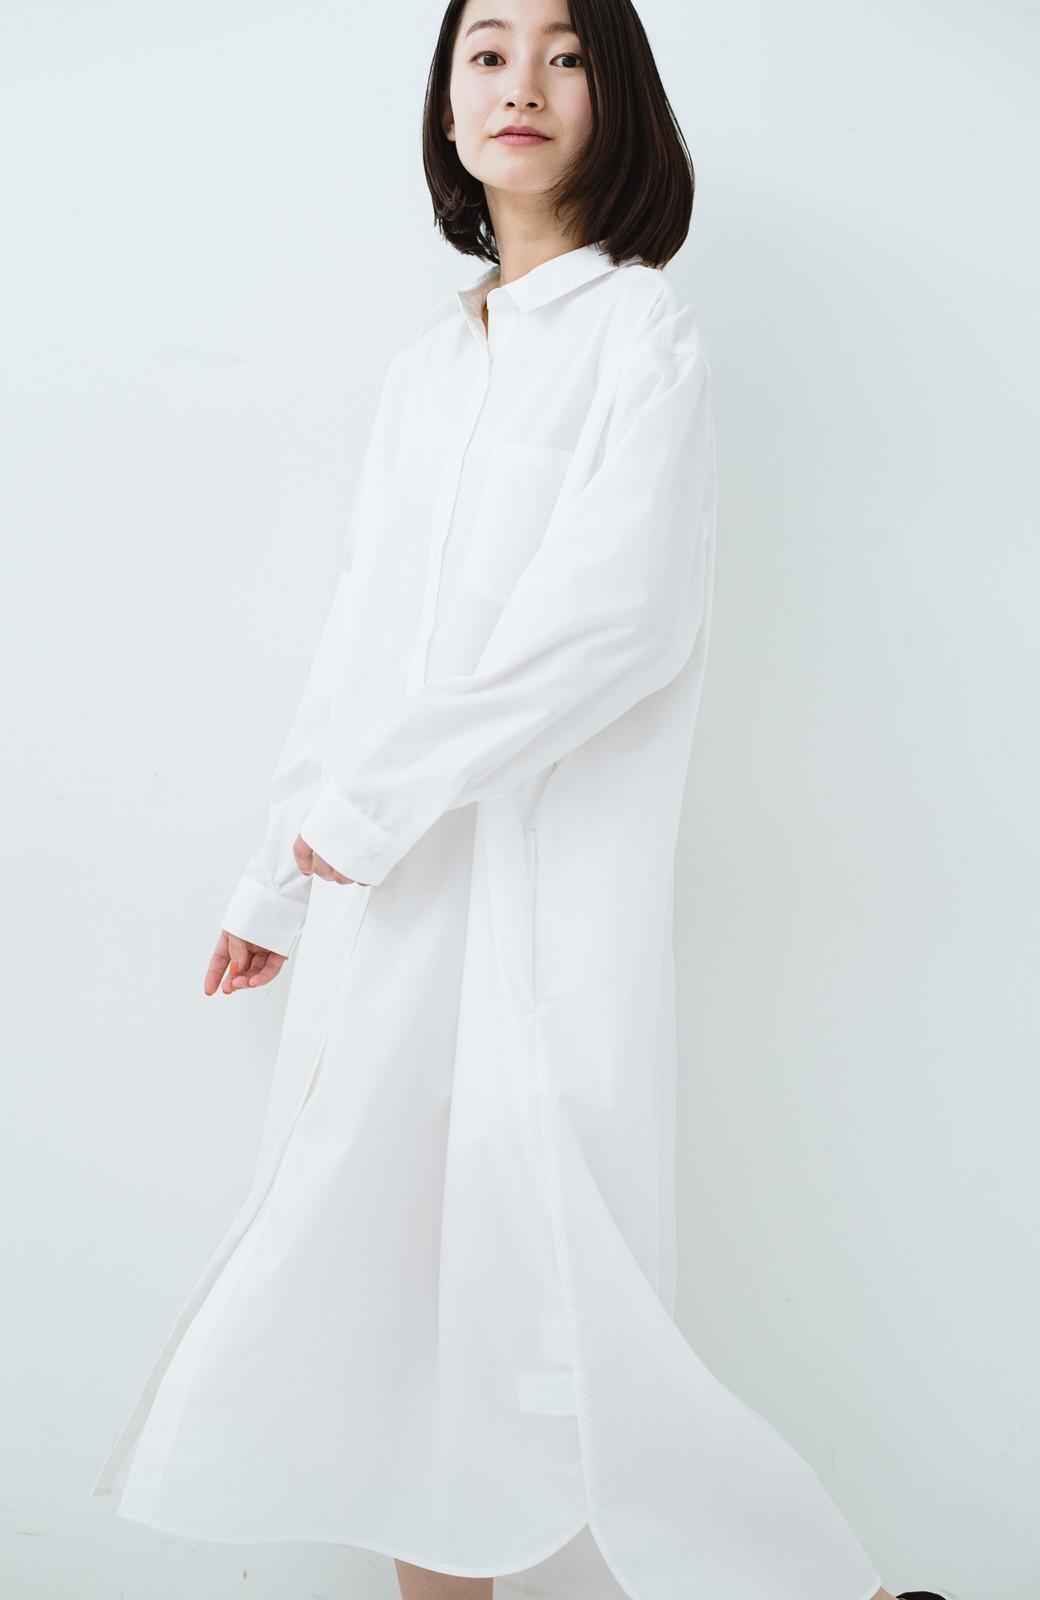 haco! 気持ちが凛と改まる リボン付きオーバーサイズシャツワンピース <ホワイト>の商品写真22